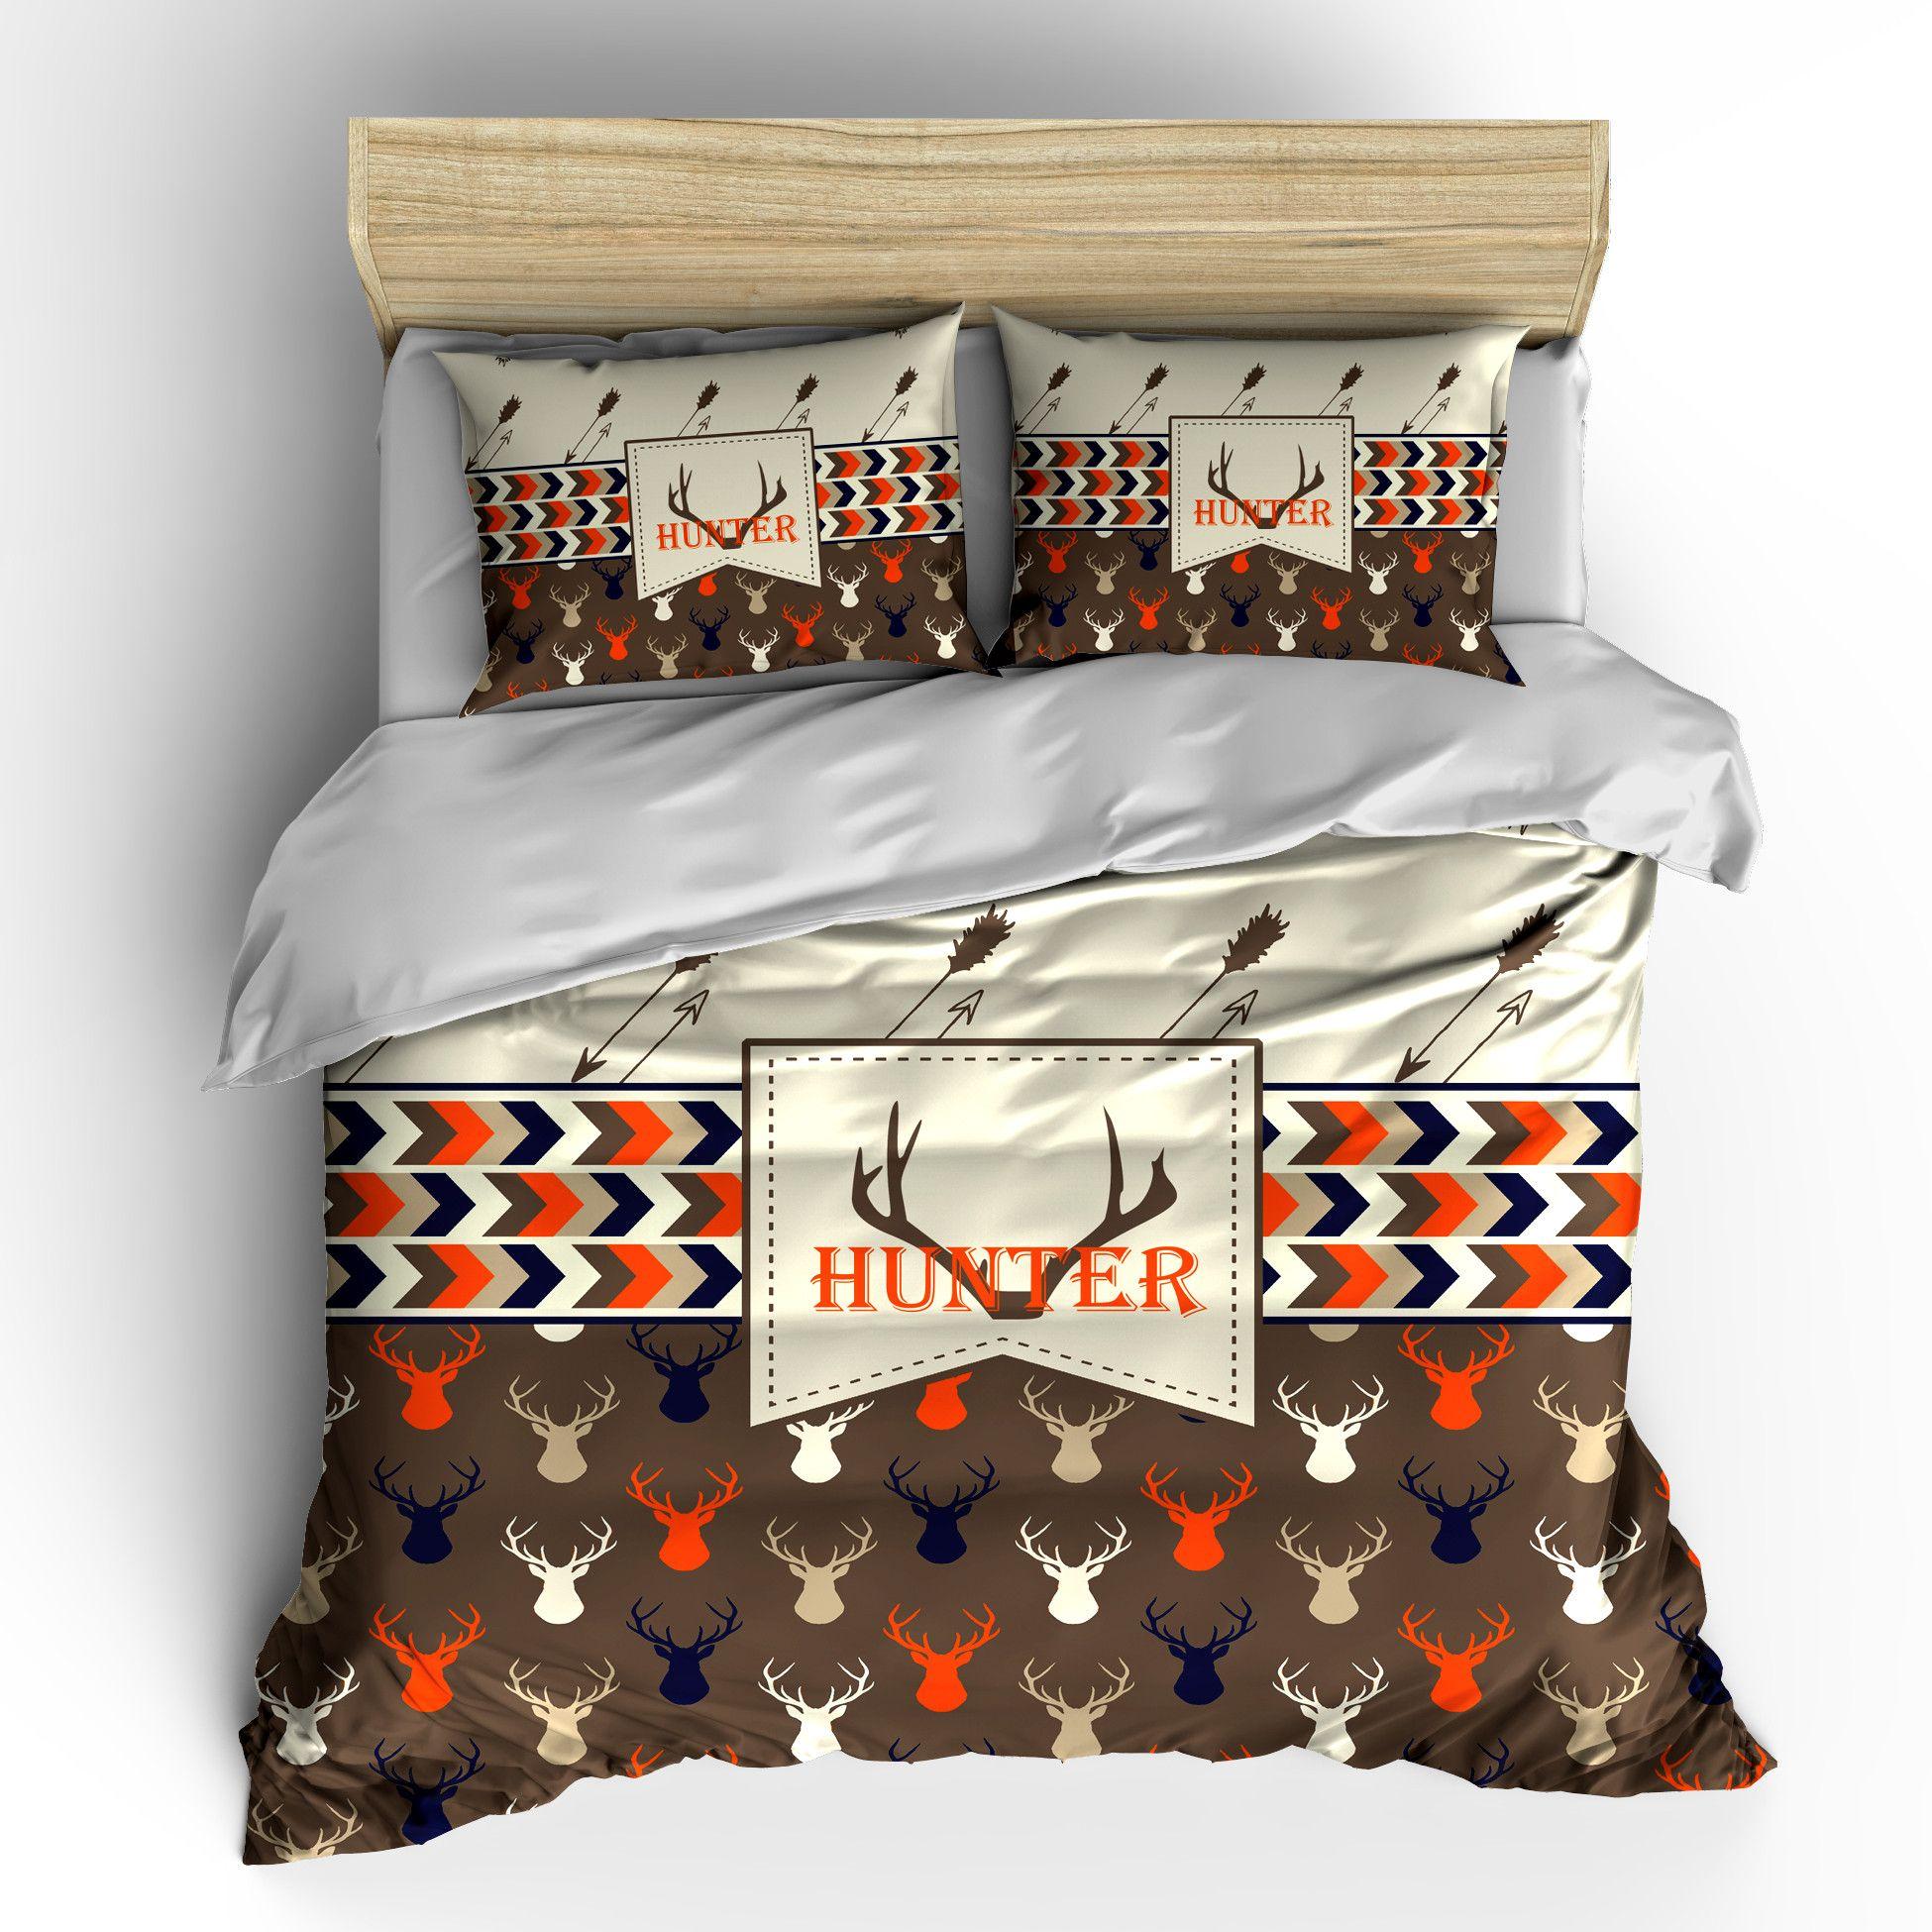 a38a3d0b09 Deer Head and Antler Bedding Set II, Duvet or Comforter – TheDezineShop